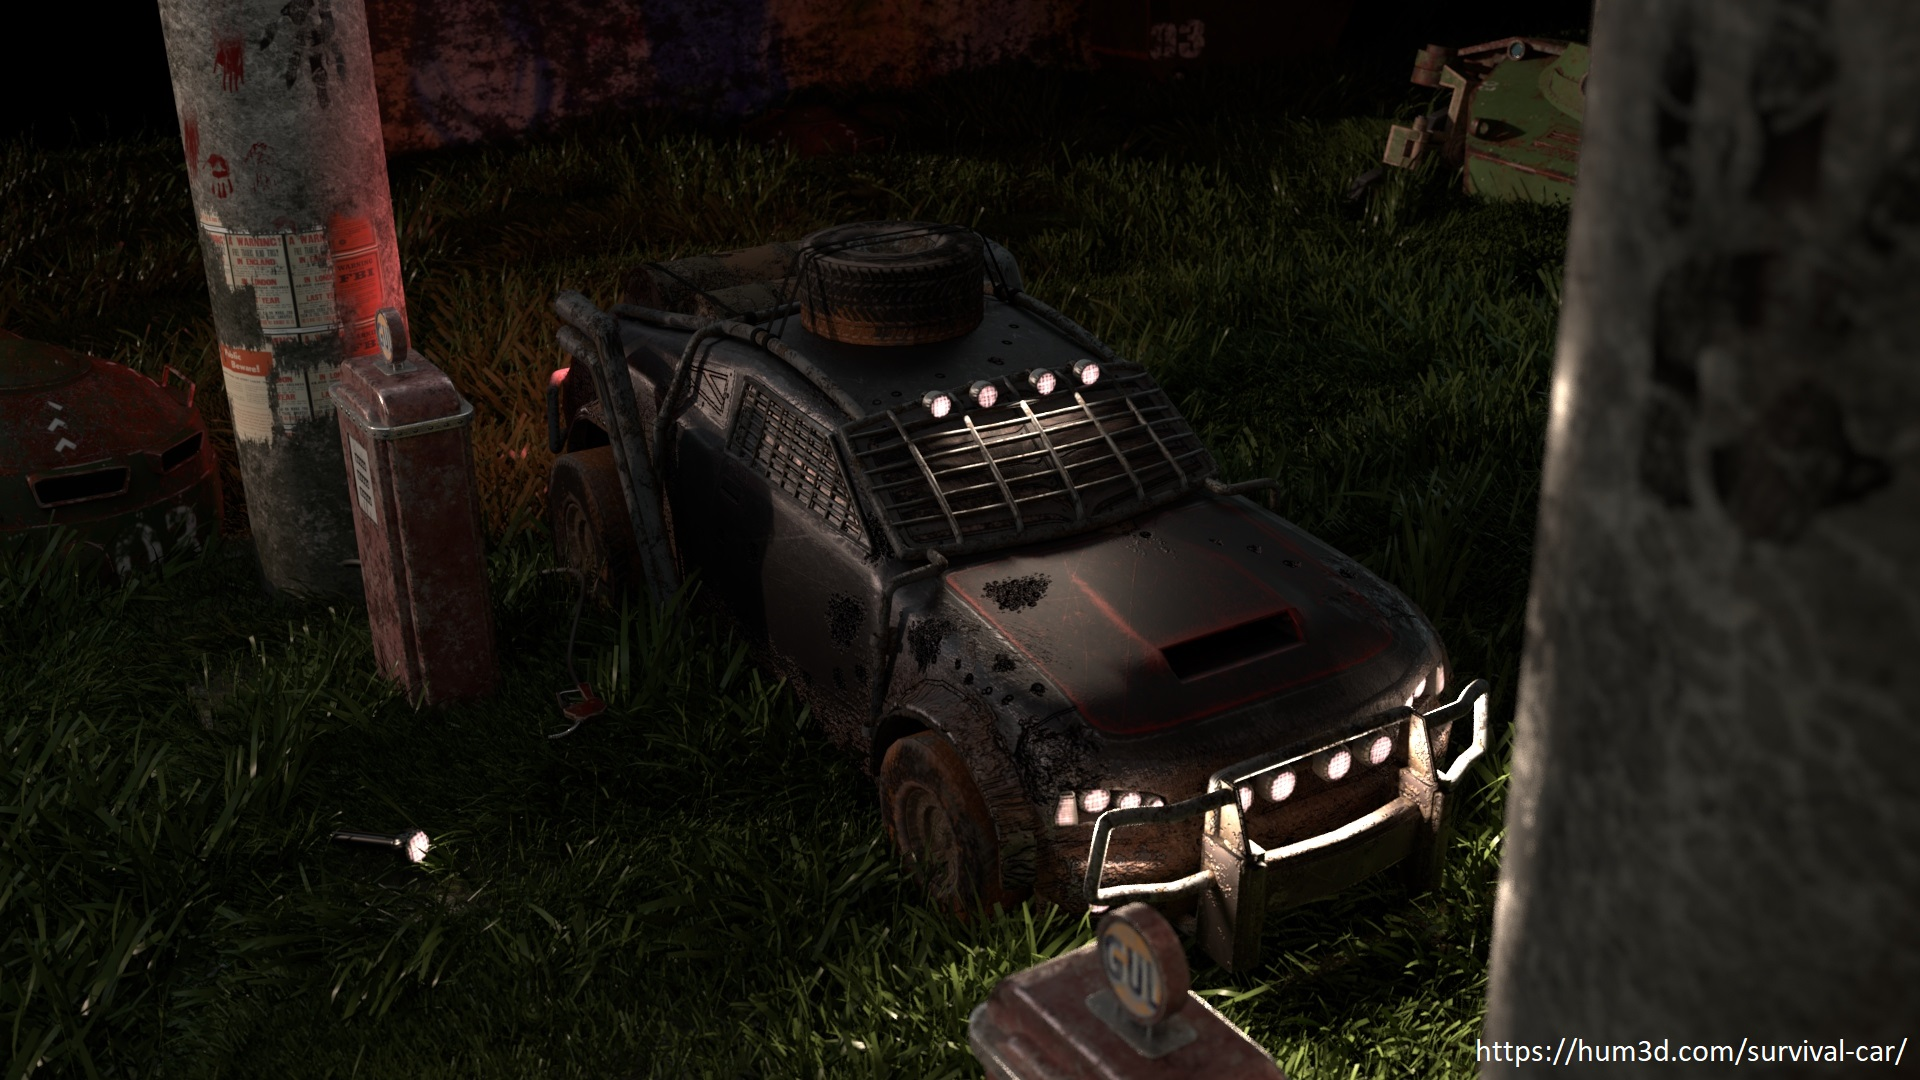 Low on fuel 3d art